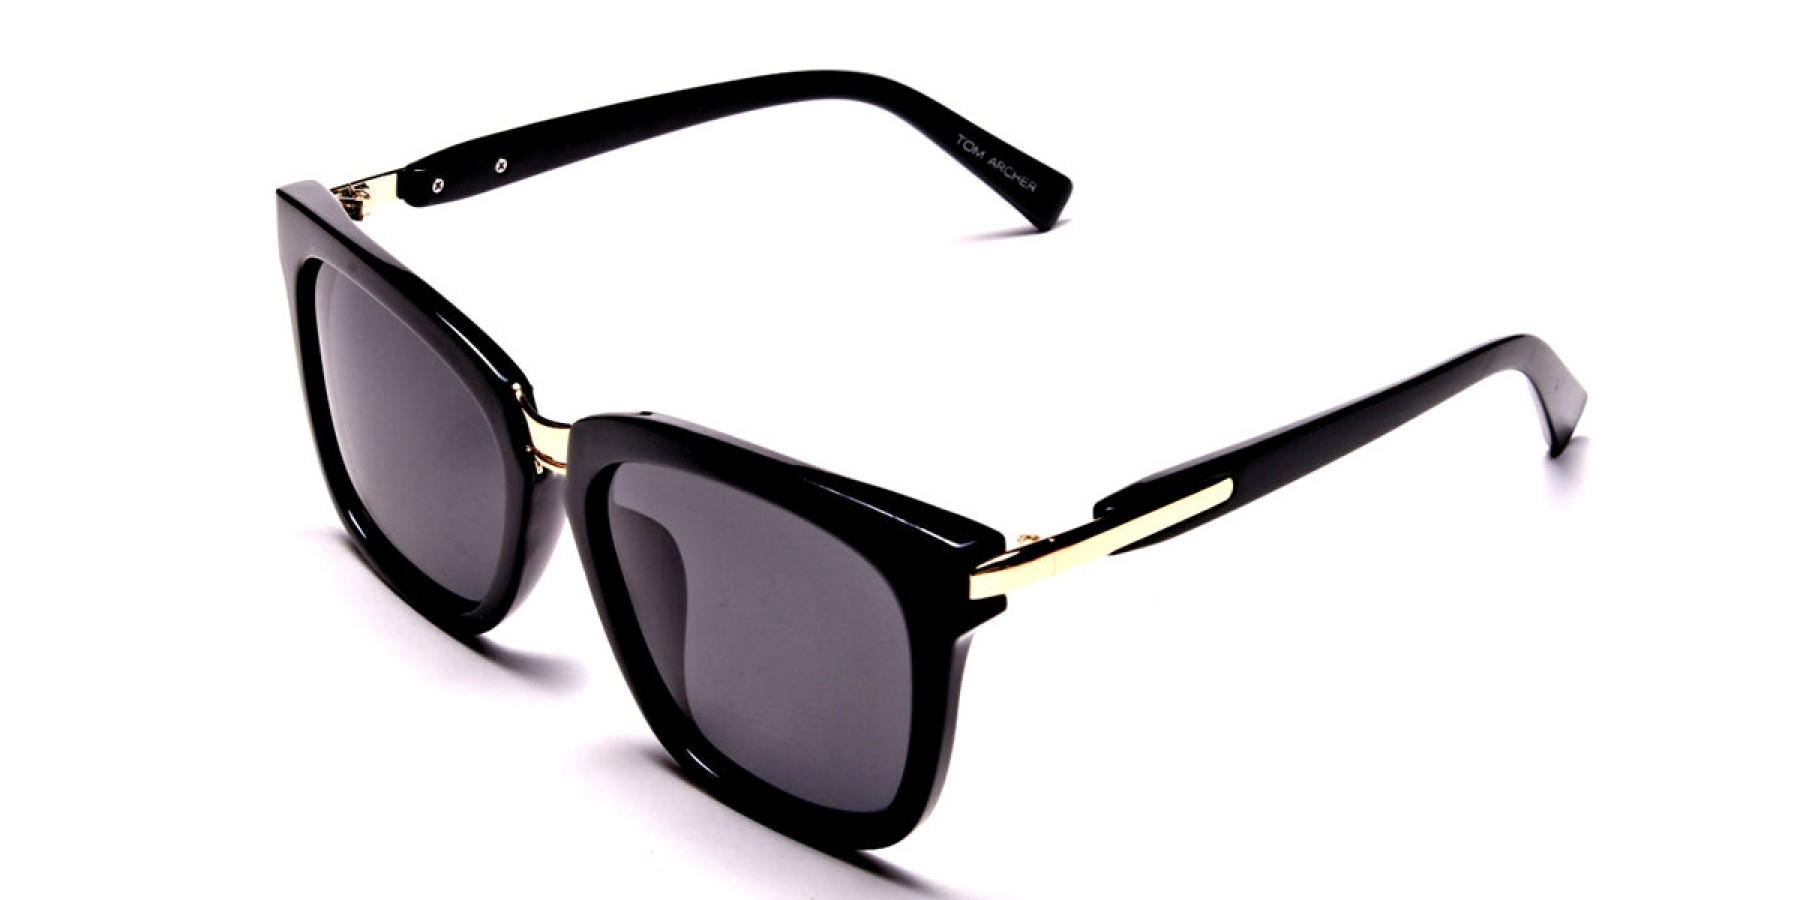 Women's Fashion Black Wayfarer Sunglasses - 2